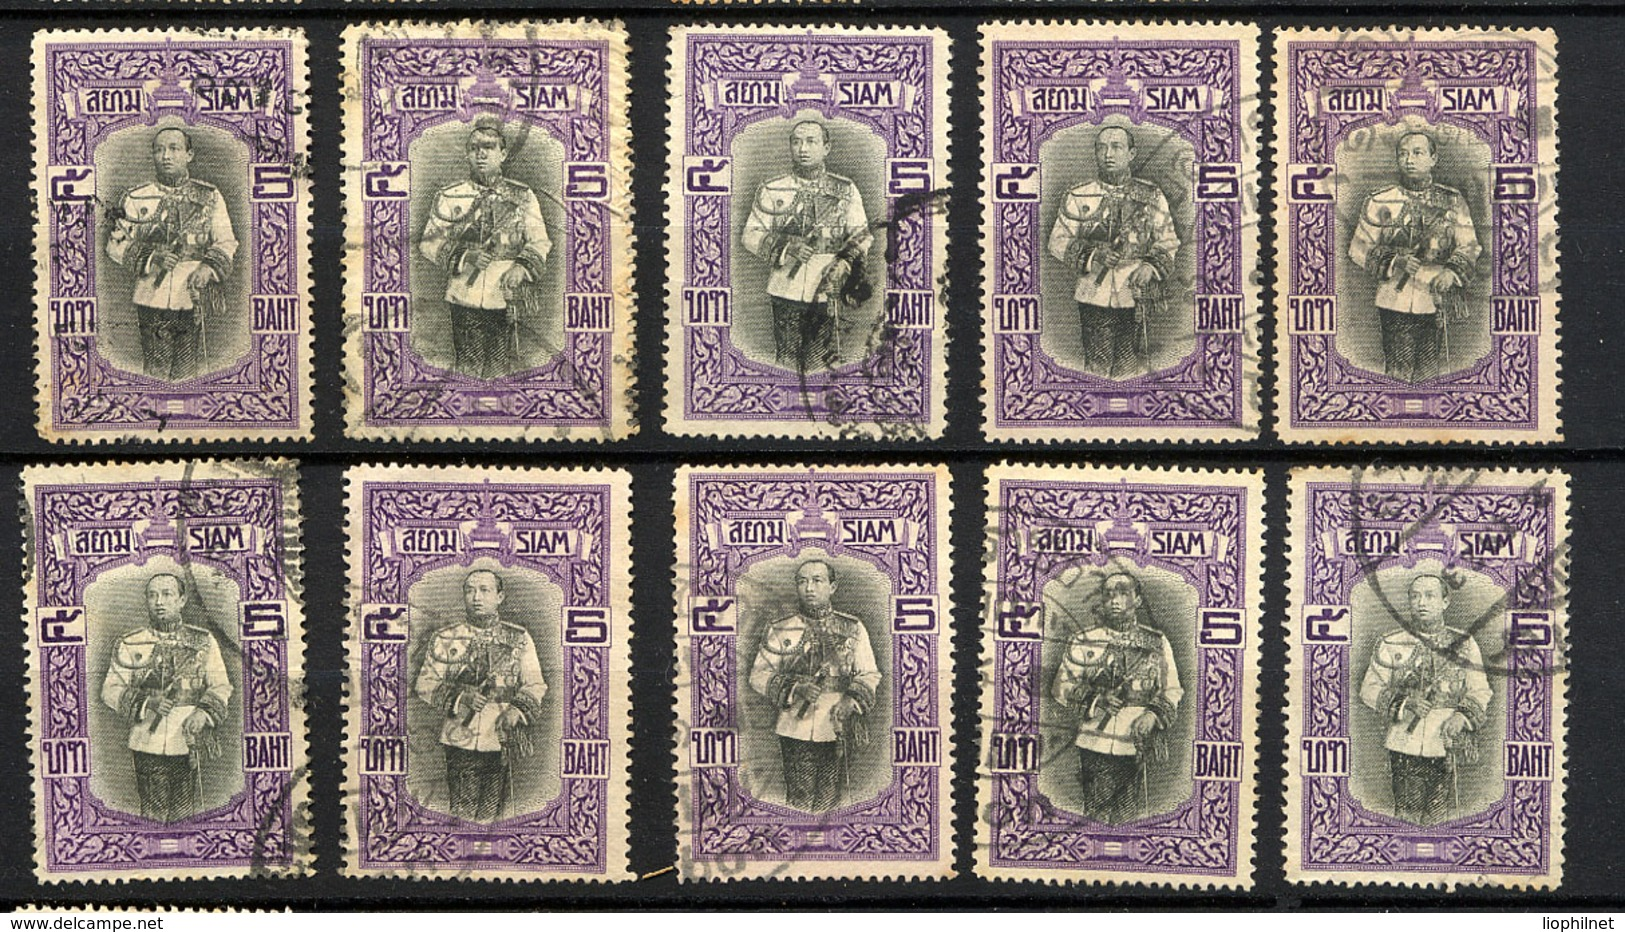 SIAM THAILAND 1912, Yvert 111, Roi Vajiravudh, 1 Valeur X 10 Exemplaires, Oblitérés / Used. R1627a - Siam